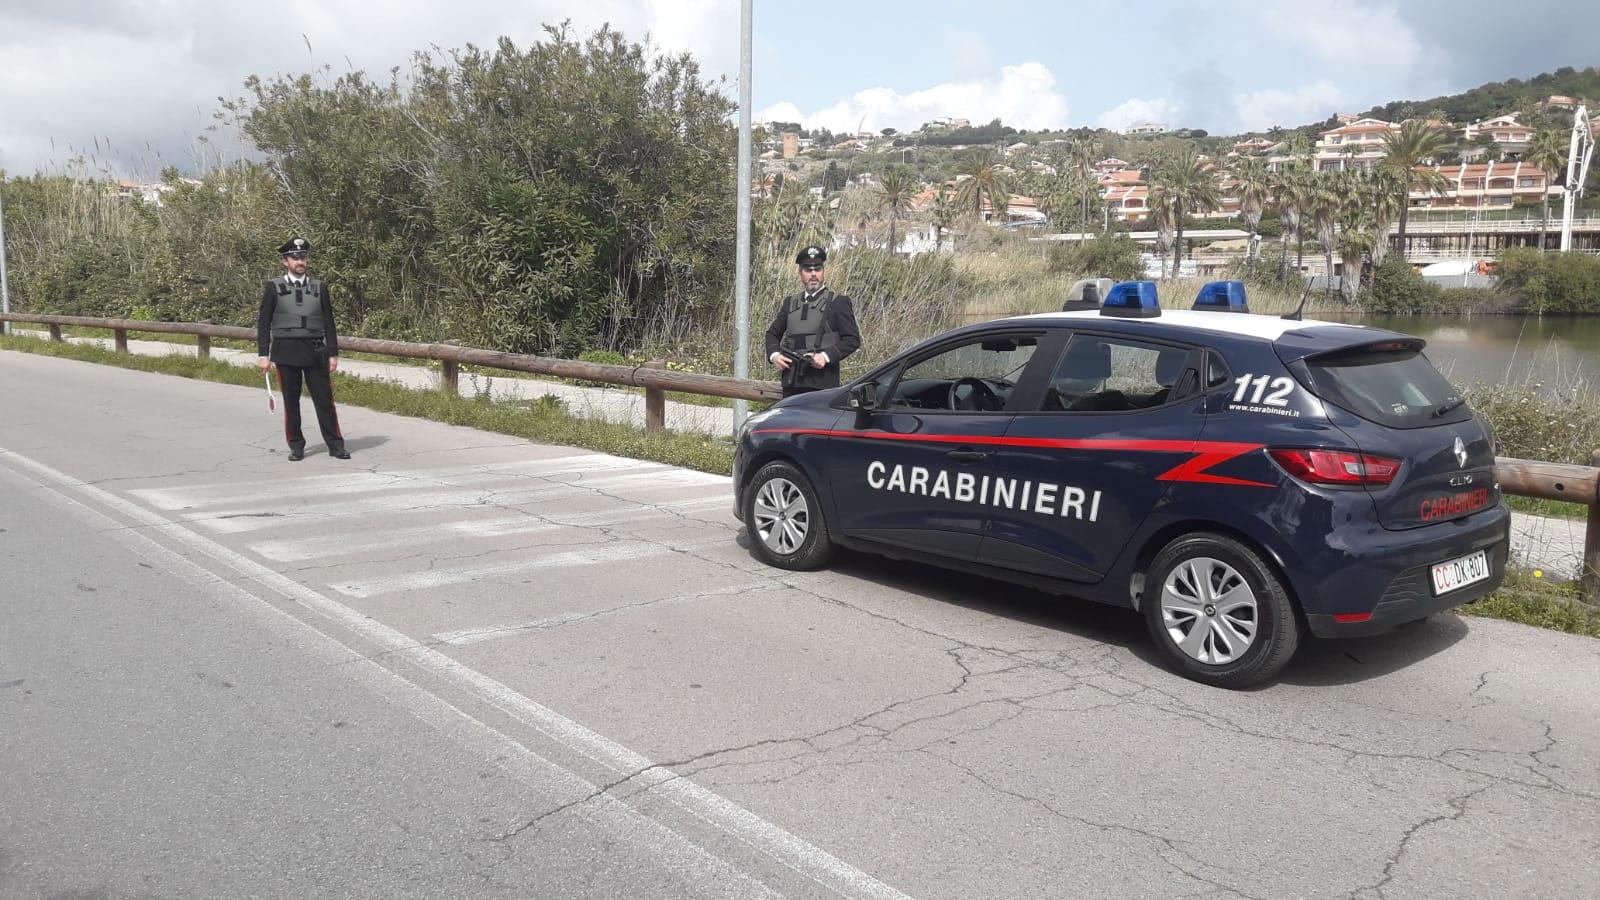 Foto di pattuglia dei carabinieri - Stazione di Ganzirri